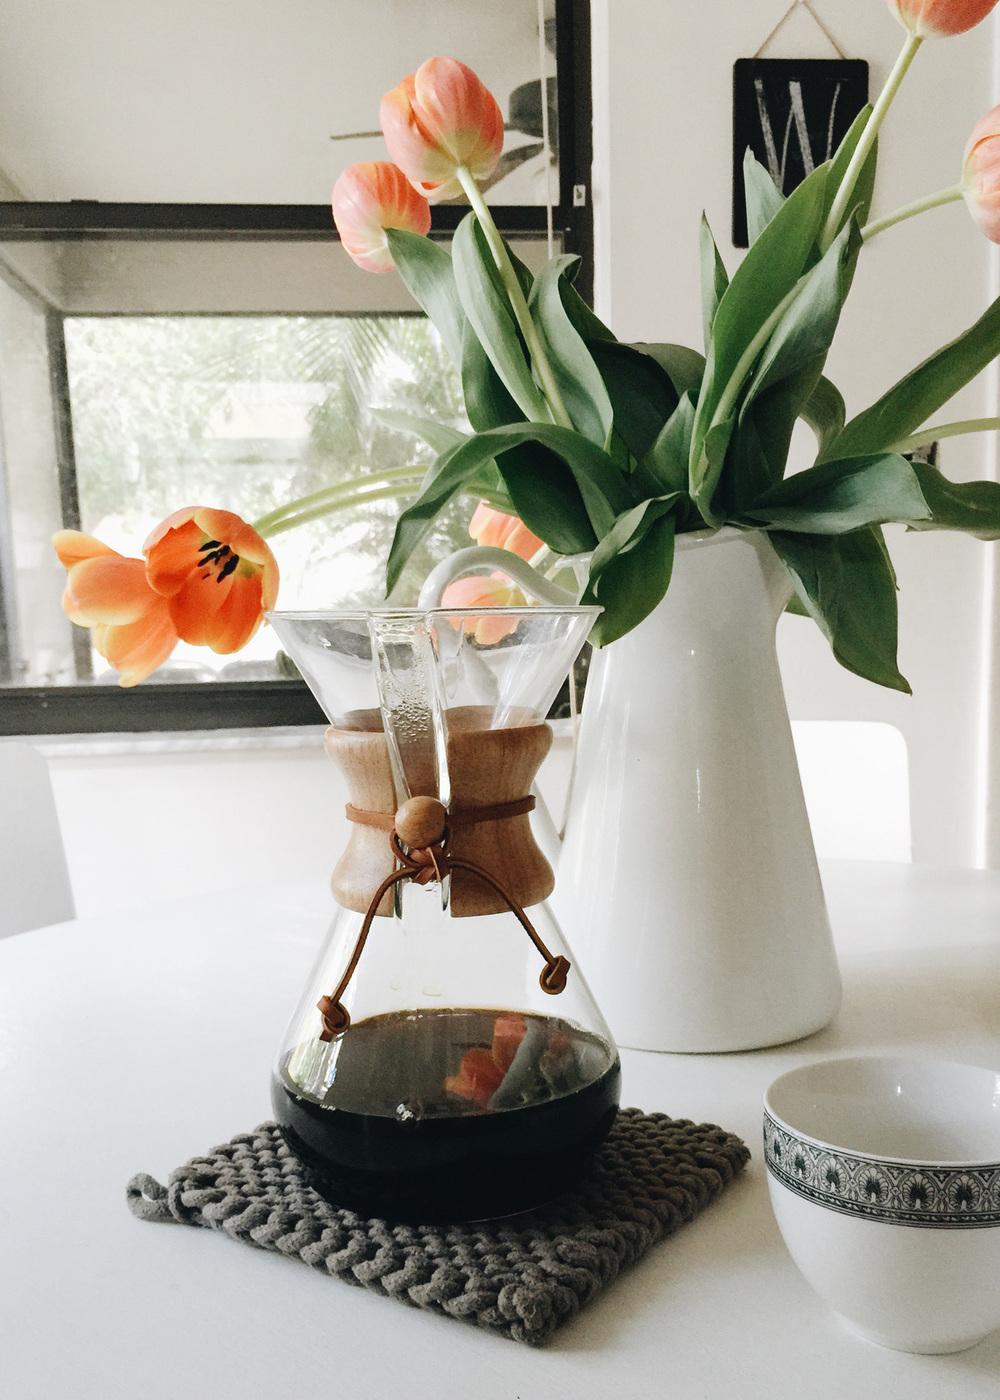 Chemex and tulips